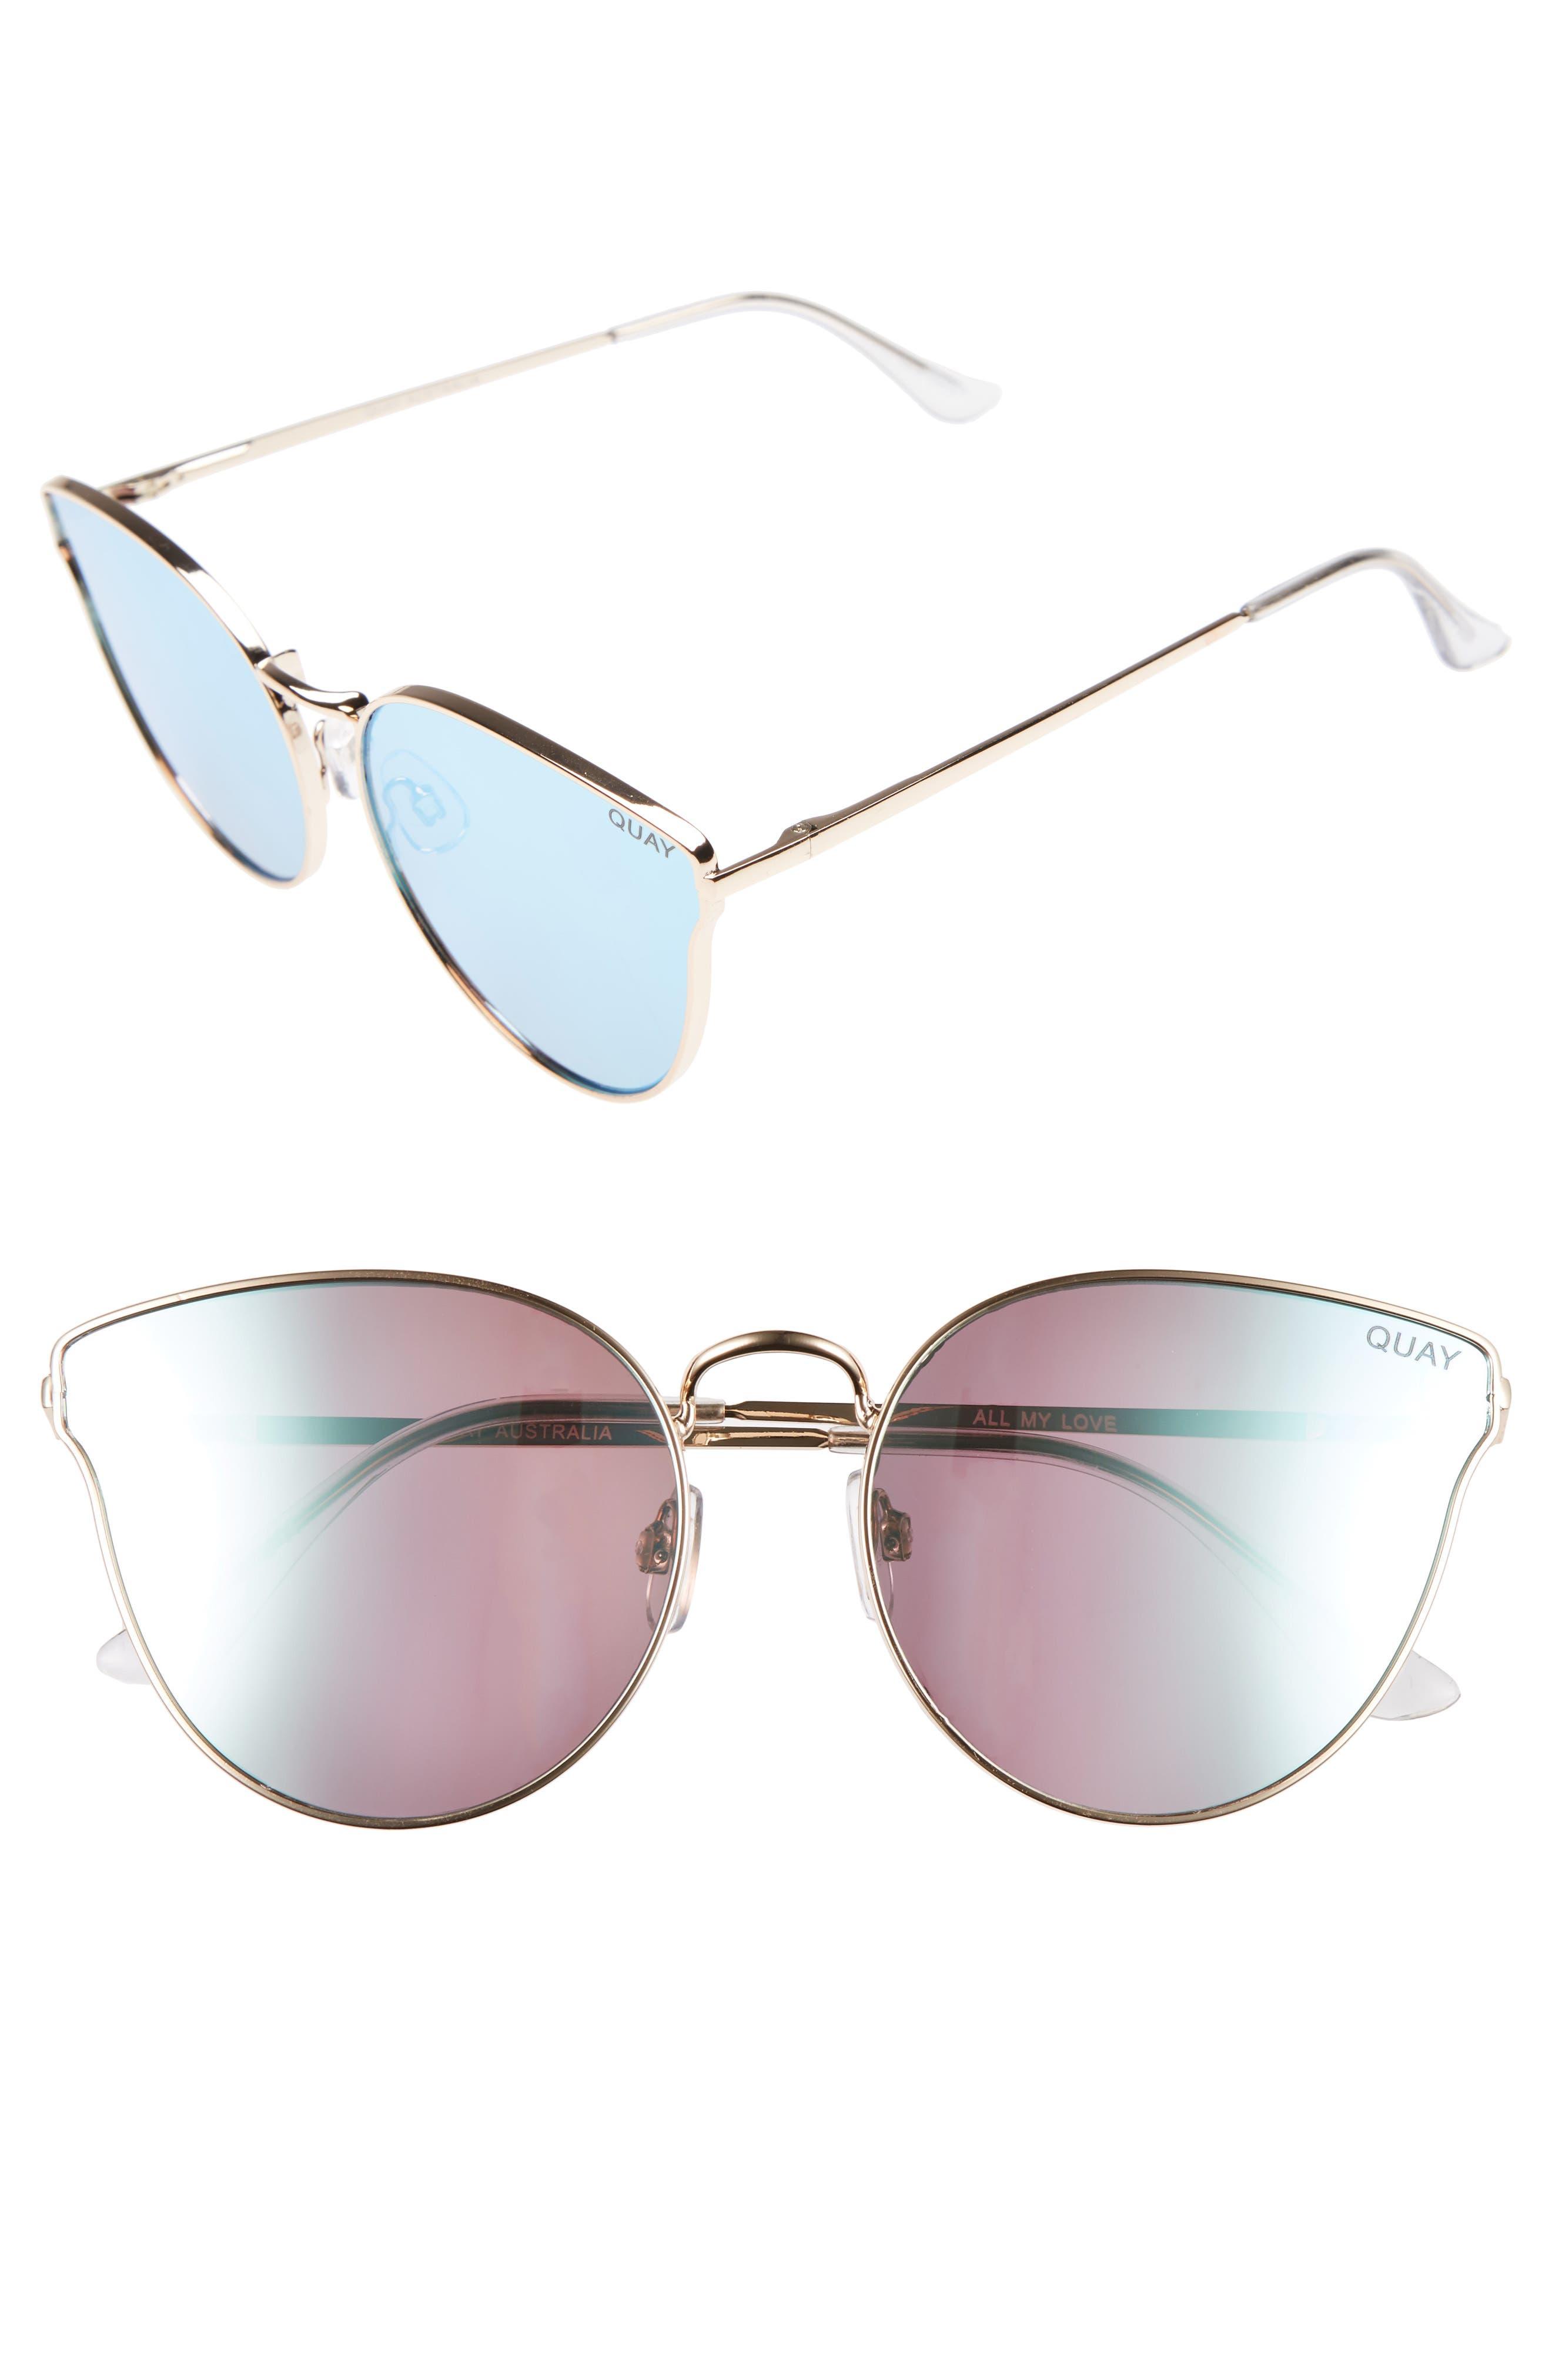 Alternate Image 1 Selected - Quay Australia 'All My Love' 60mm Retro Sunglasses